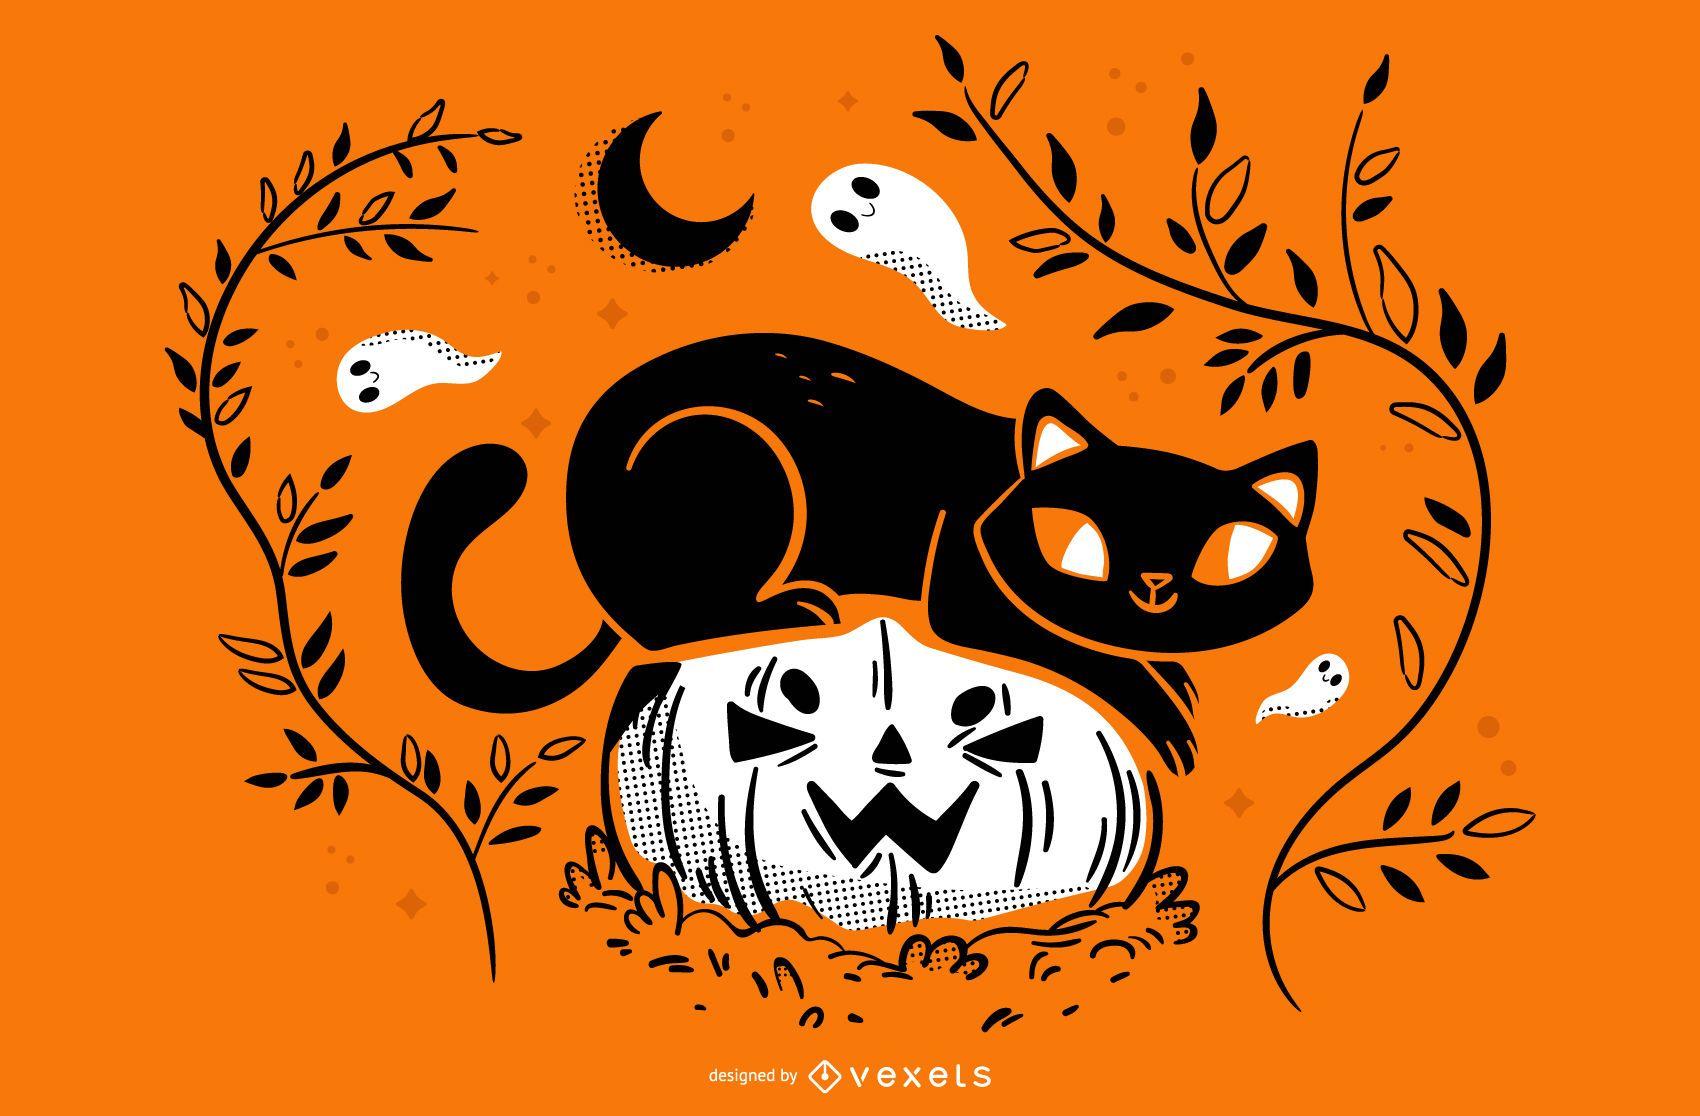 Pumpkin cat halloween illustration